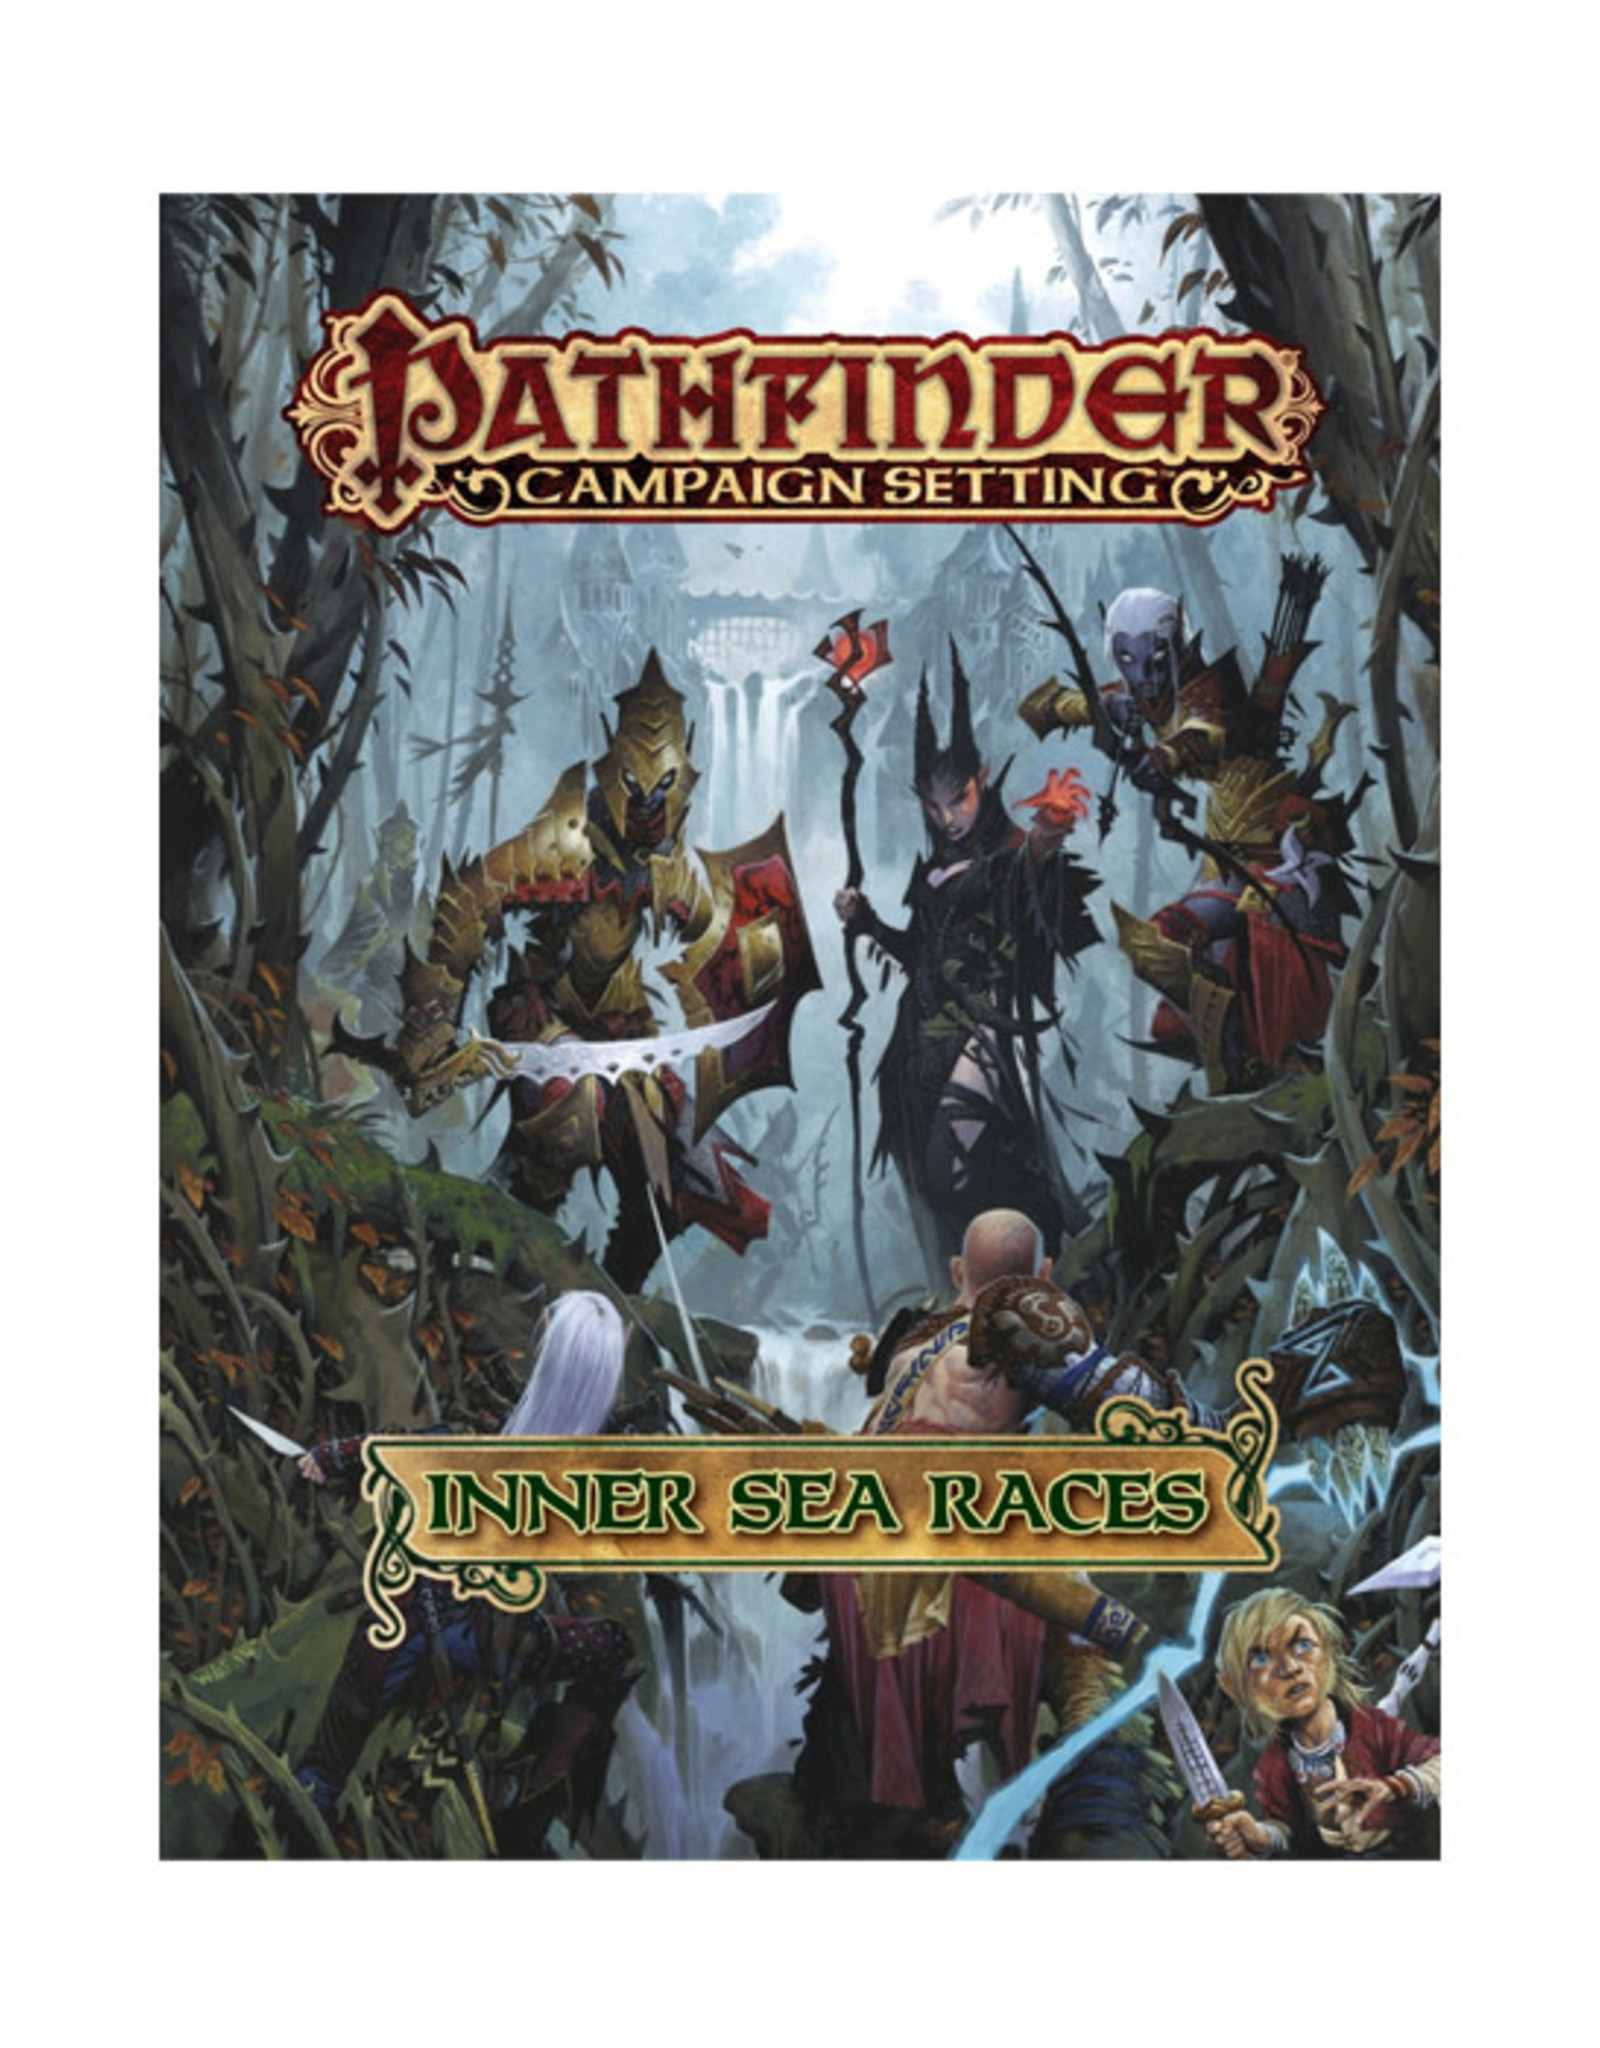 Pathfinder Pathfinder: Campaign Setting - Inner Sea Races